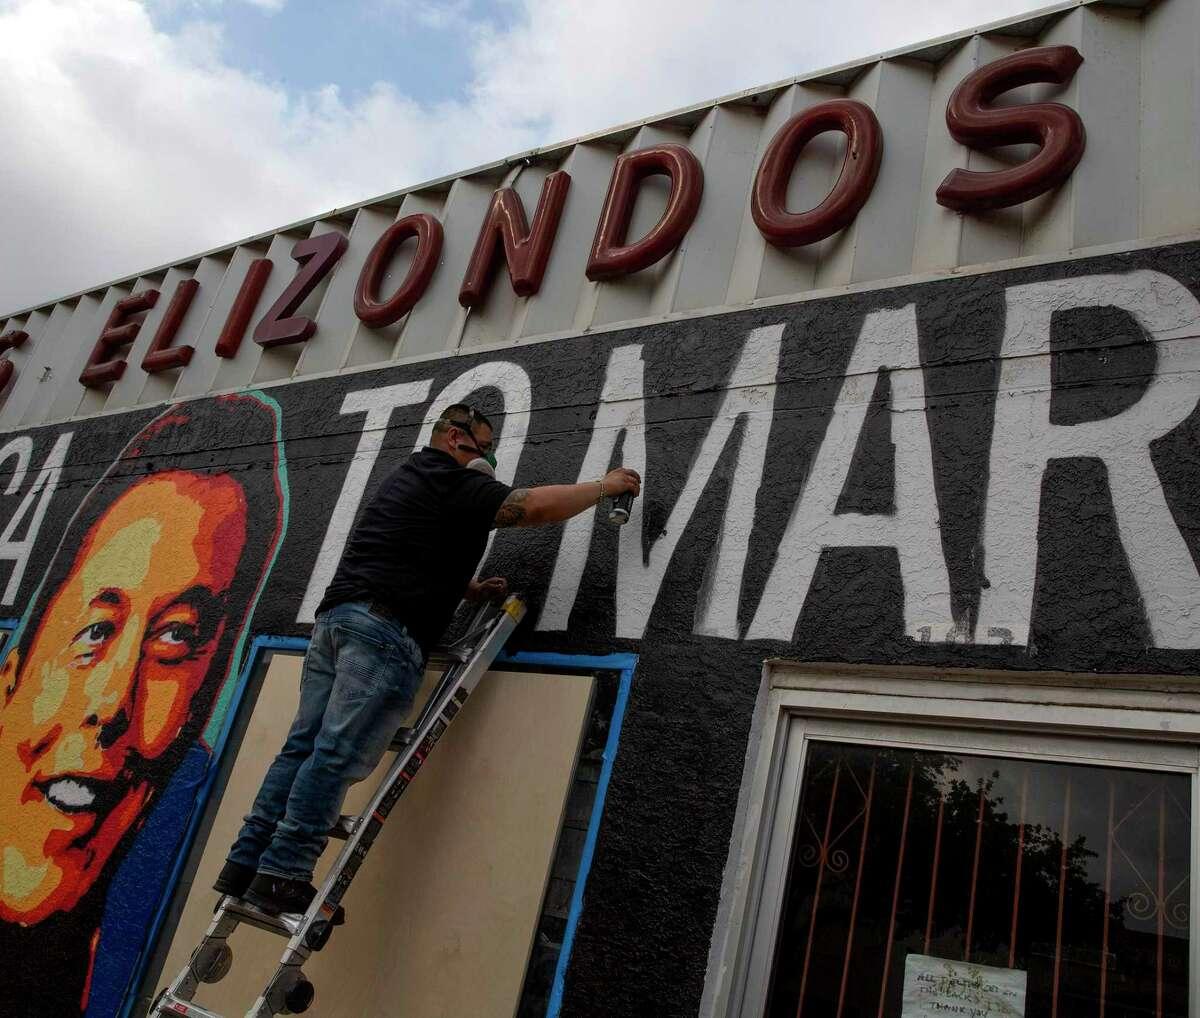 Alexandro Gonzalez-Hernandez paints a mural depicting Elon Musk in downtown Brownsville.